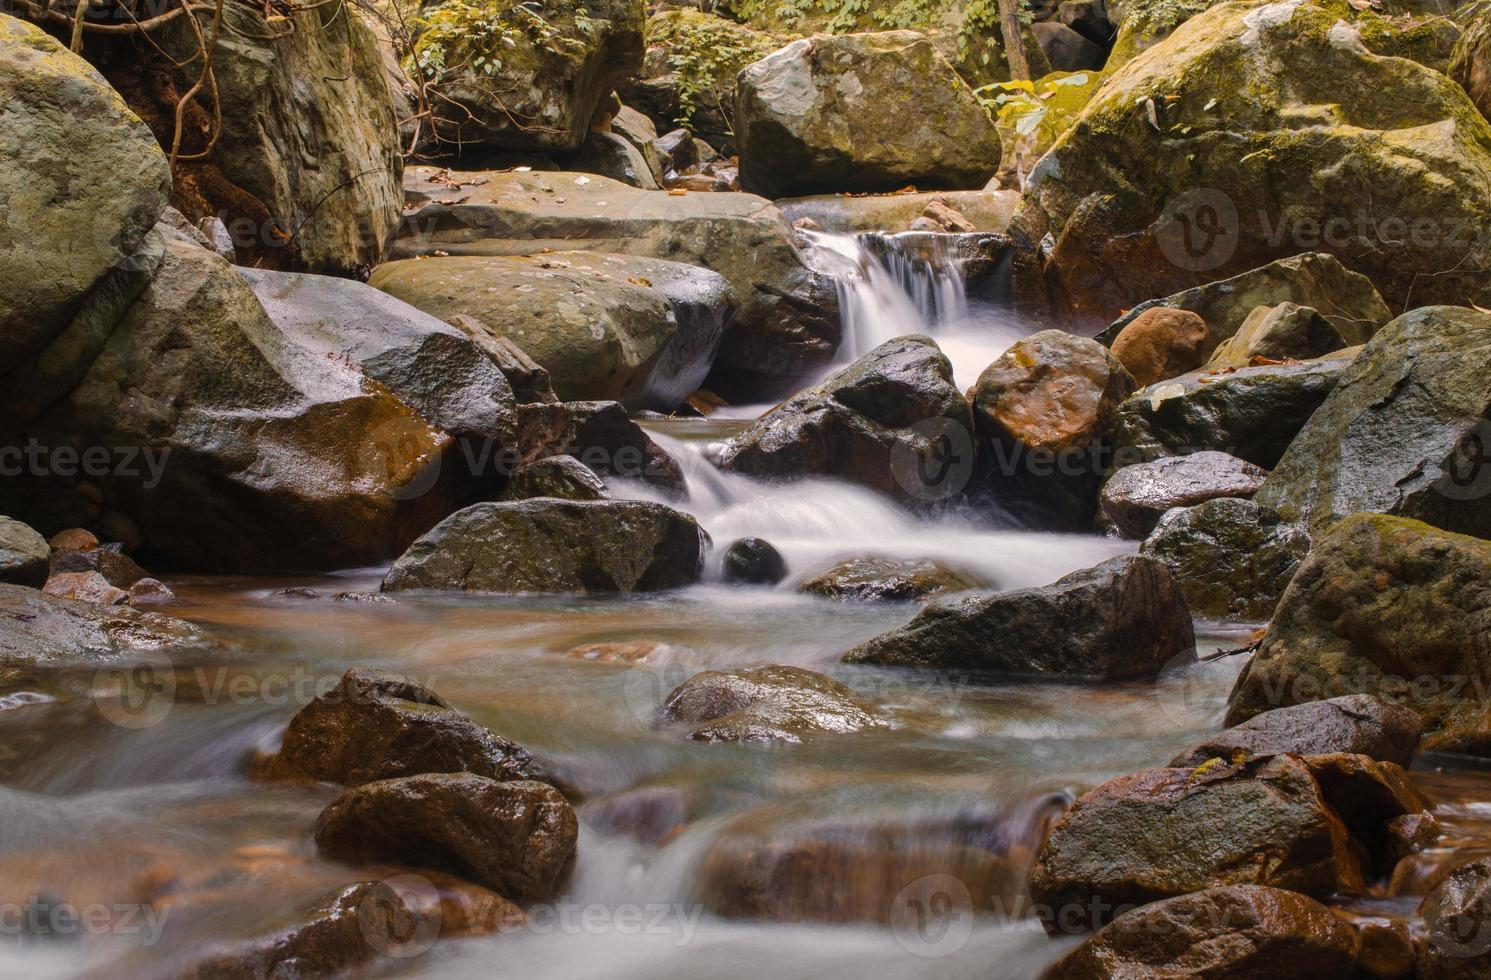 waterval in diepe regenwoud jungle in nationaal park, foto